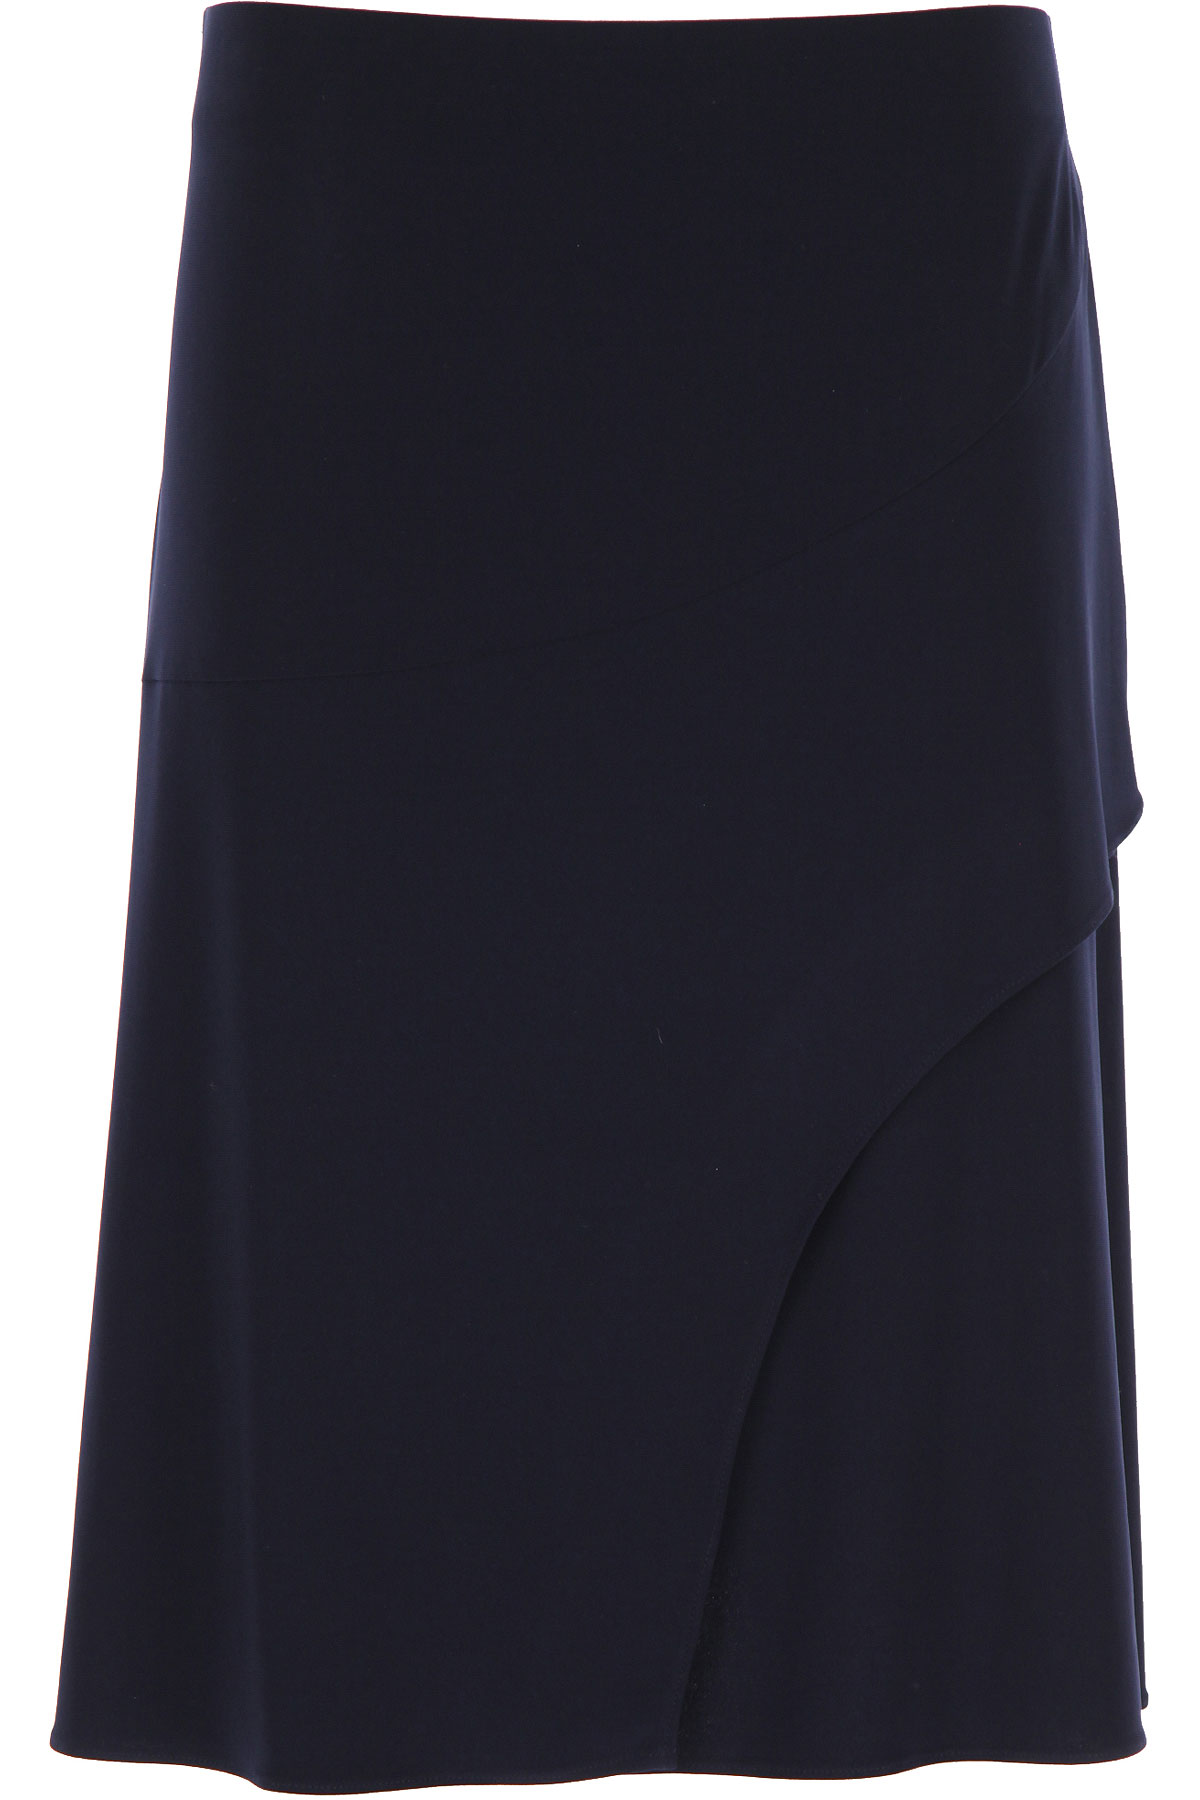 Joseph Ribkoff Skirt for Women On Sale, Midnight Blue, polyester, 2019, 30 32